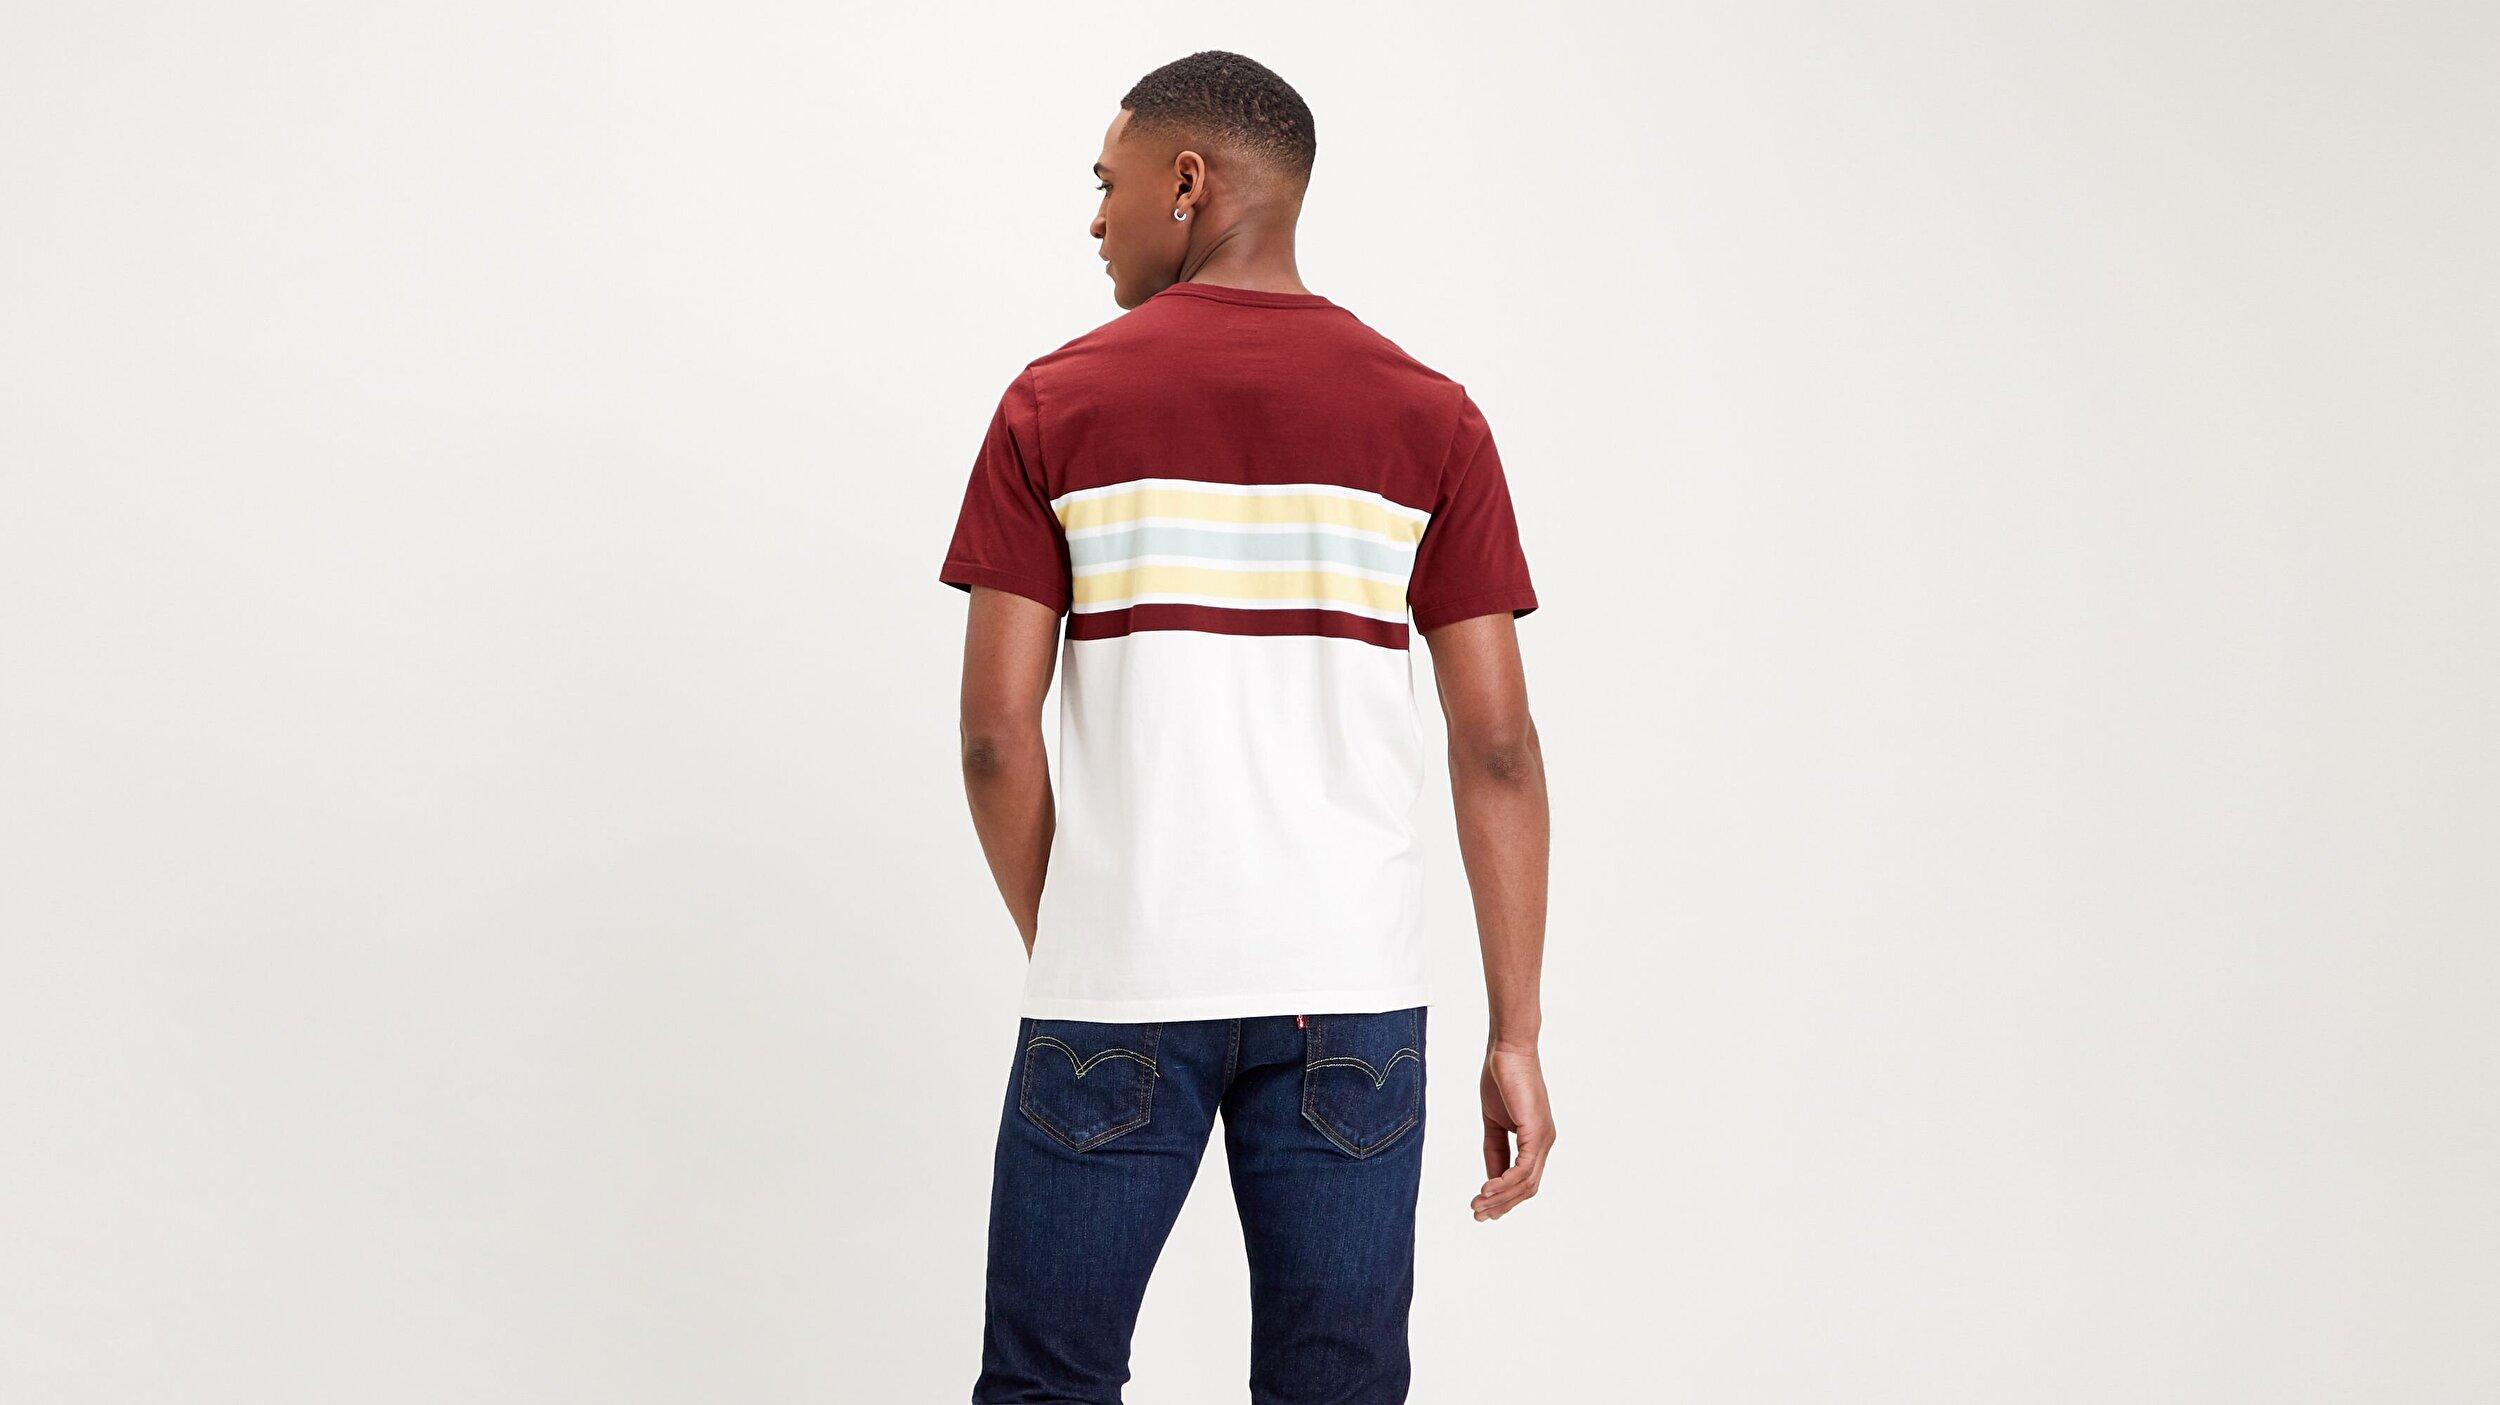 Ss Original Hm Tee Pop Stripe Çok renkli Erkek Tişört